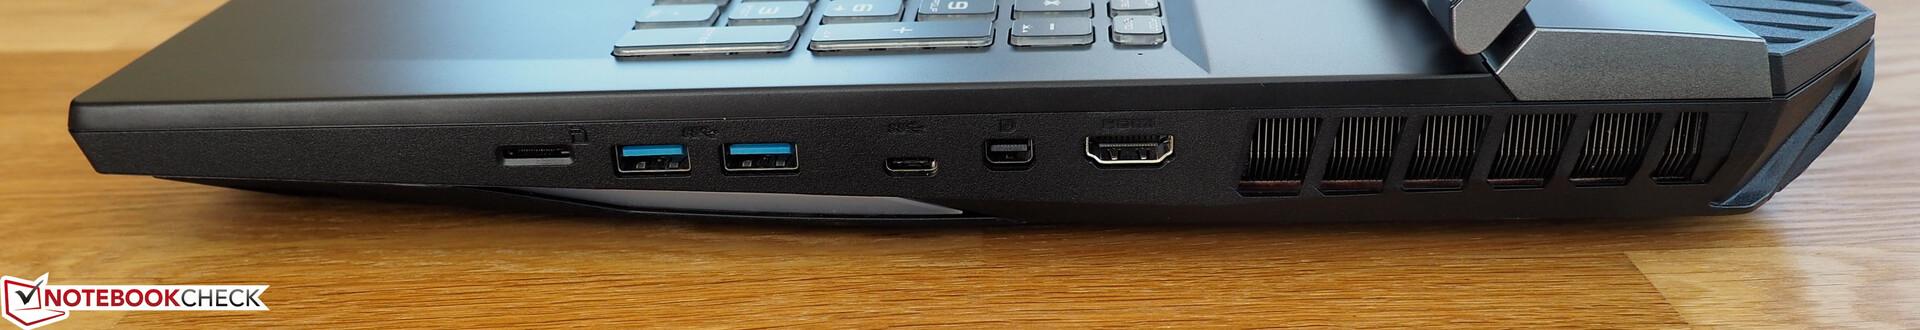 MSI GT76 9SG 笔记本电脑评测:游戏巨人 - Notebookcheck